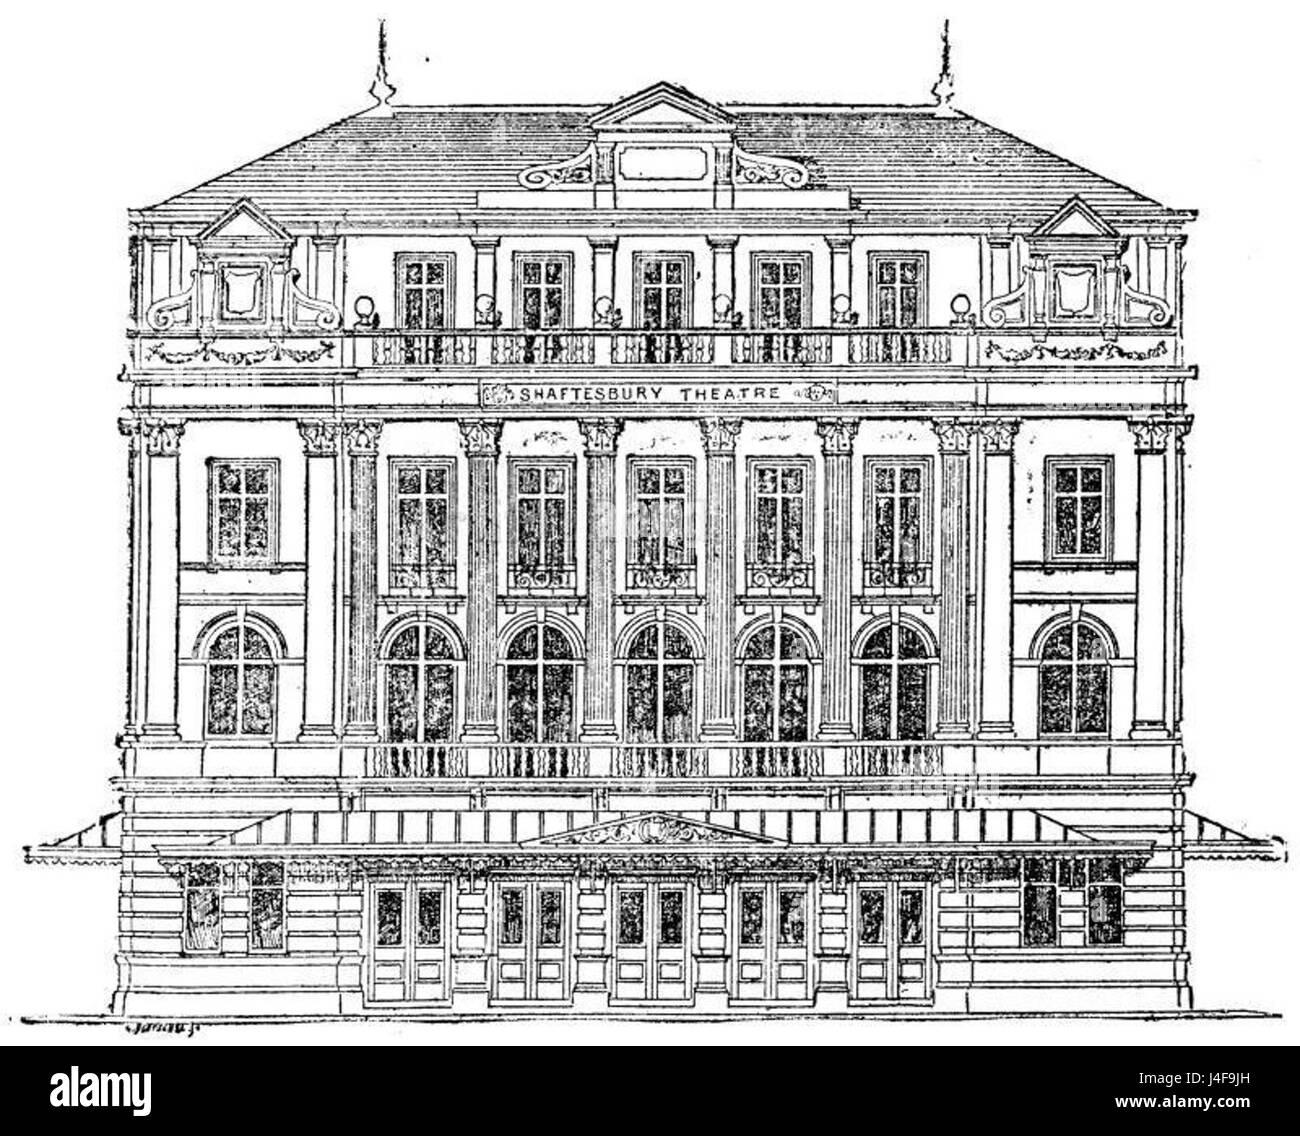 Shaftesbury Theatre 1888 1941 - Stock Image